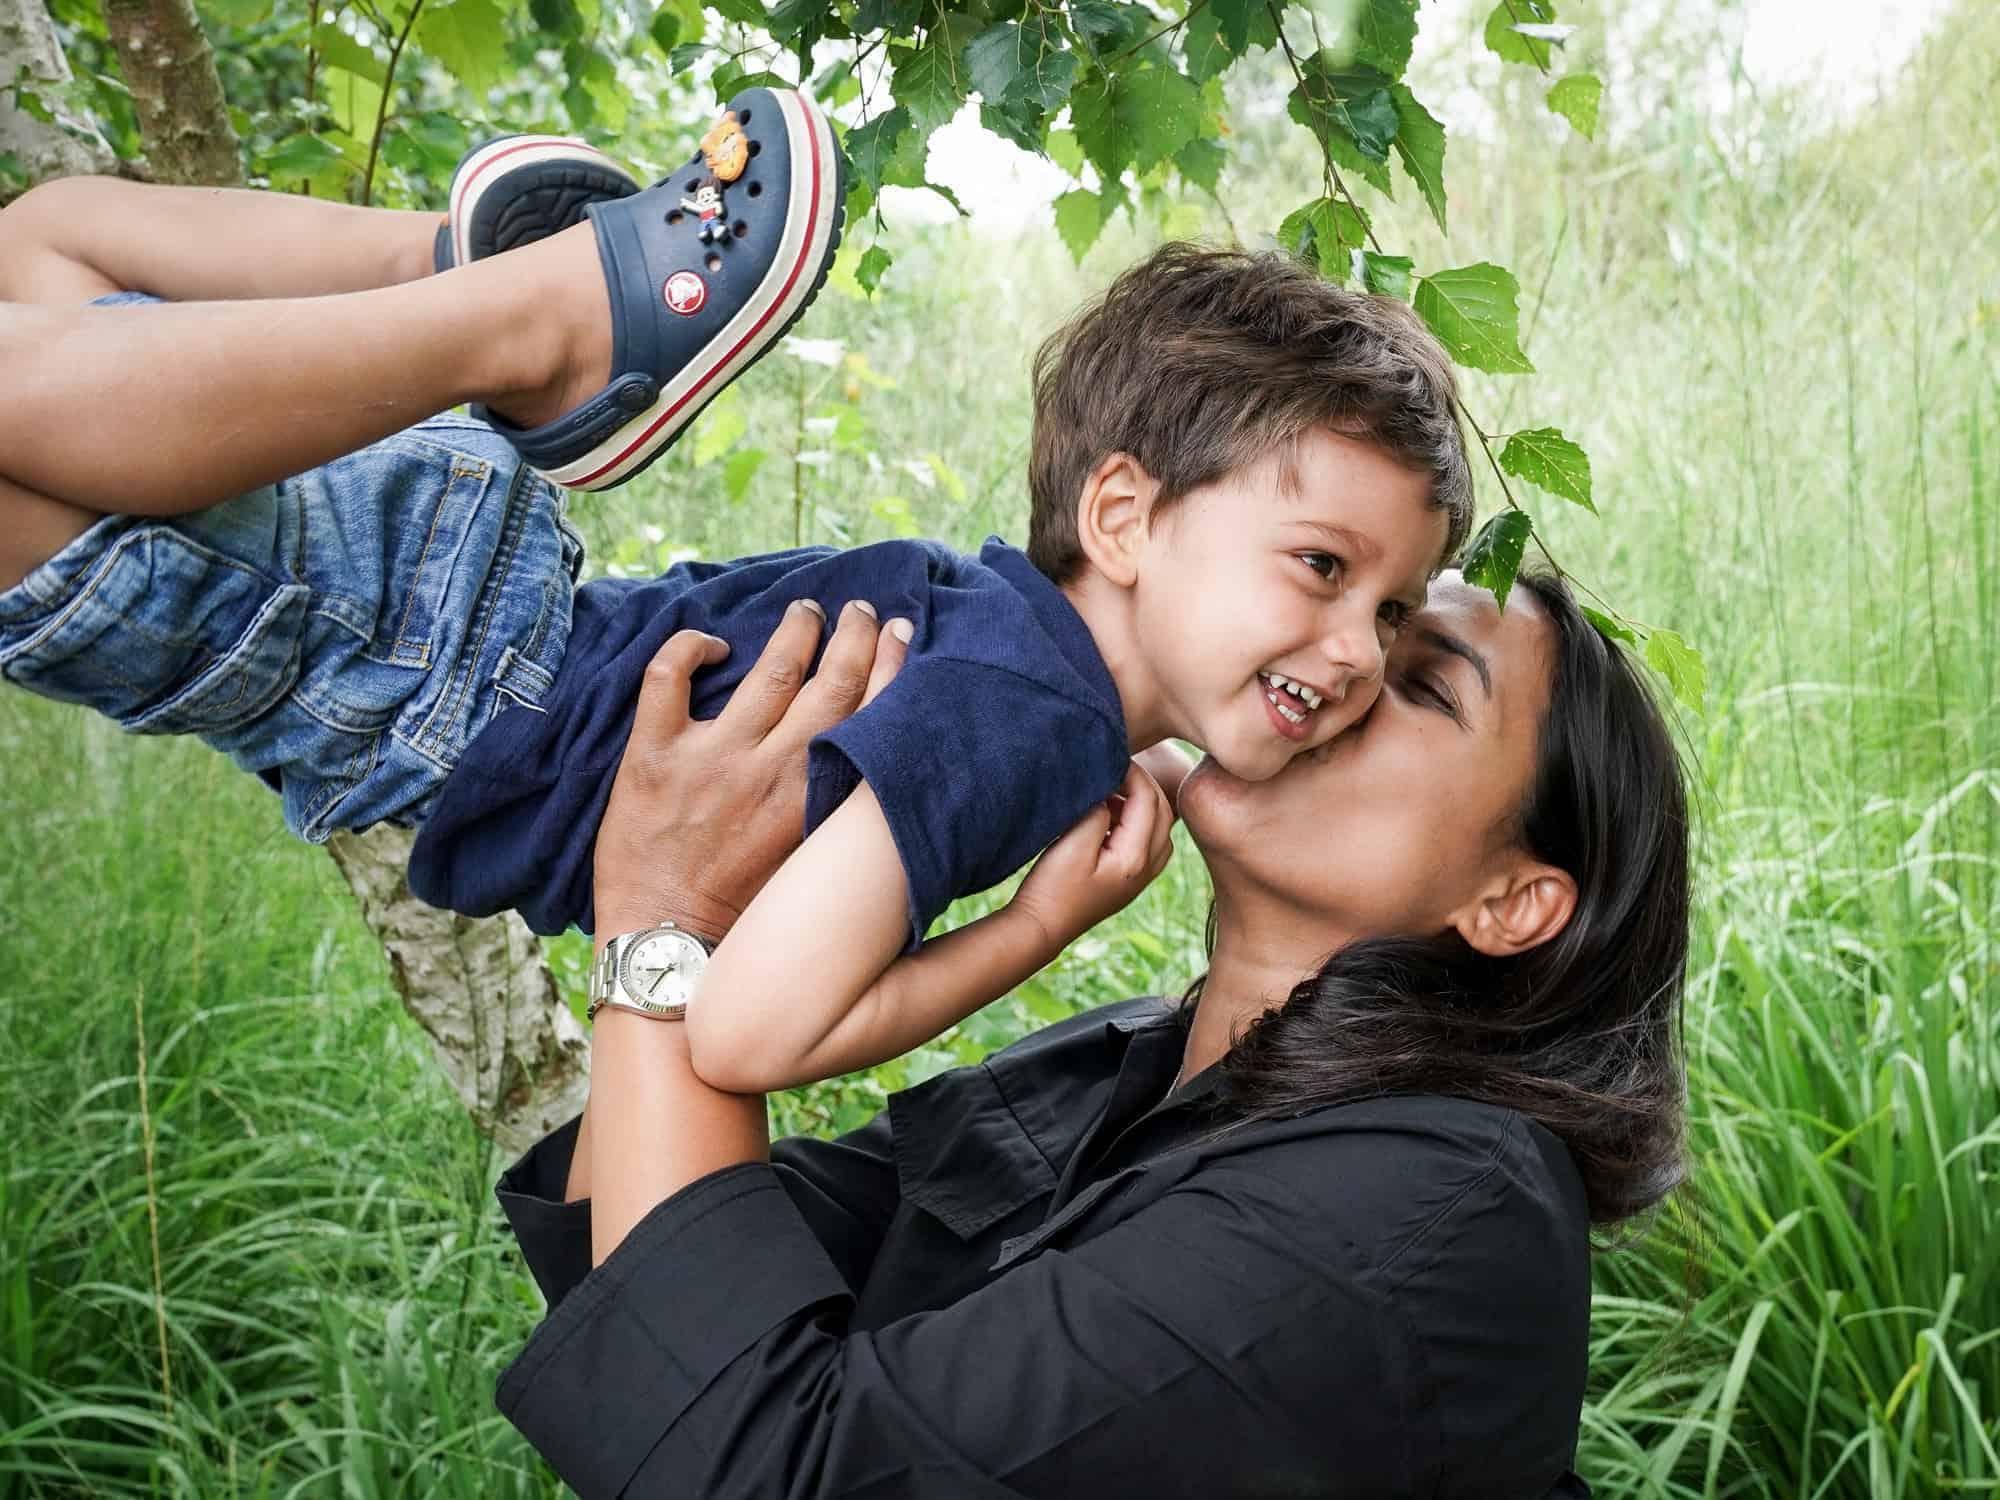 Solo Mum Photographer Luci Schofield capturing the joy of parenting